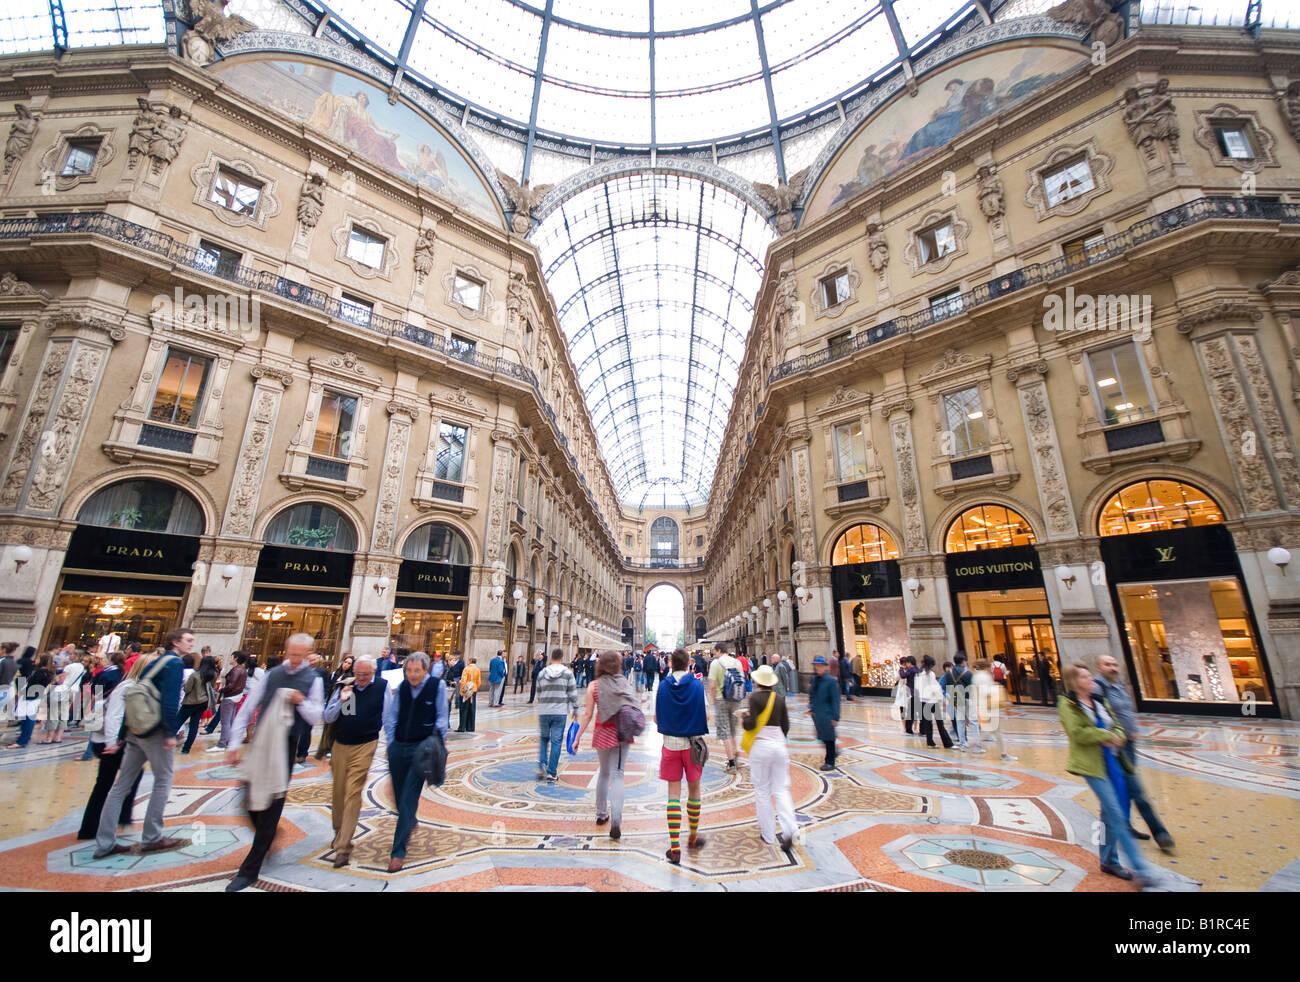 People inside Galleria Vittorio Emanuele 2nd Milan Italy - Stock Image